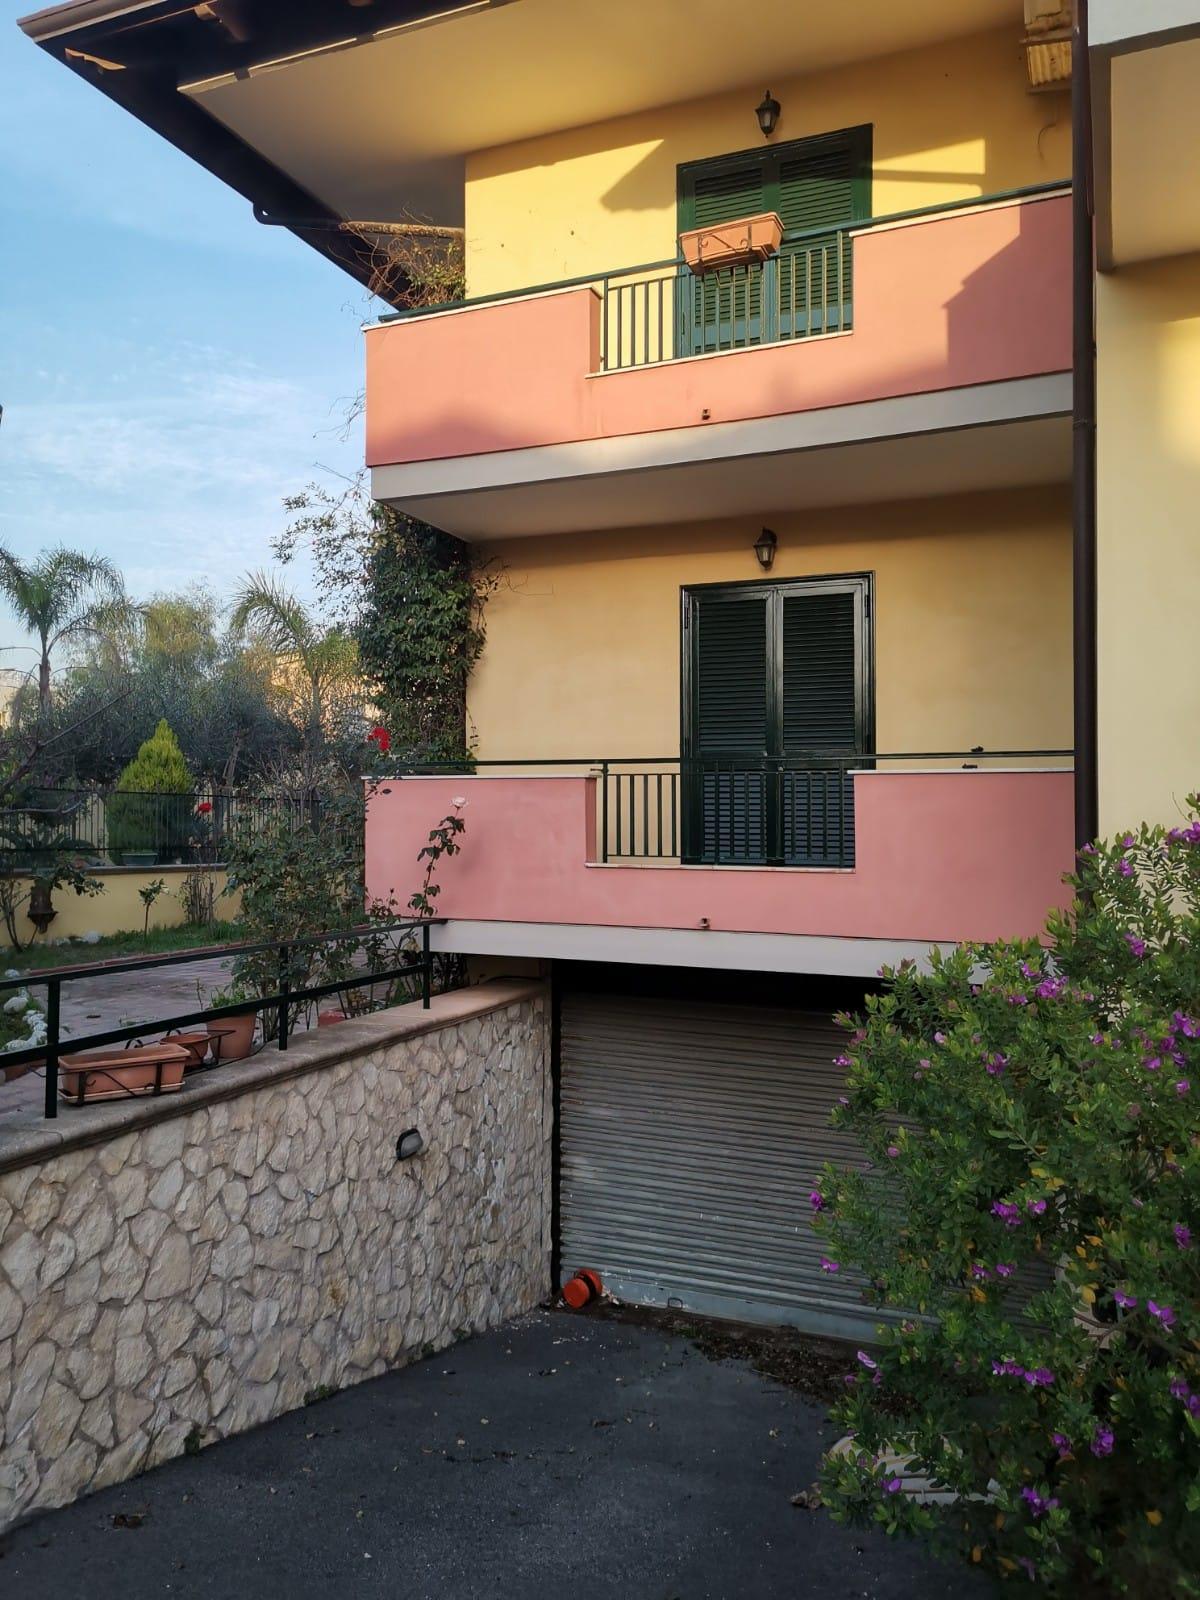 VILLA 3 LIVELLI+GARAGE Lago Patria Rif 37289